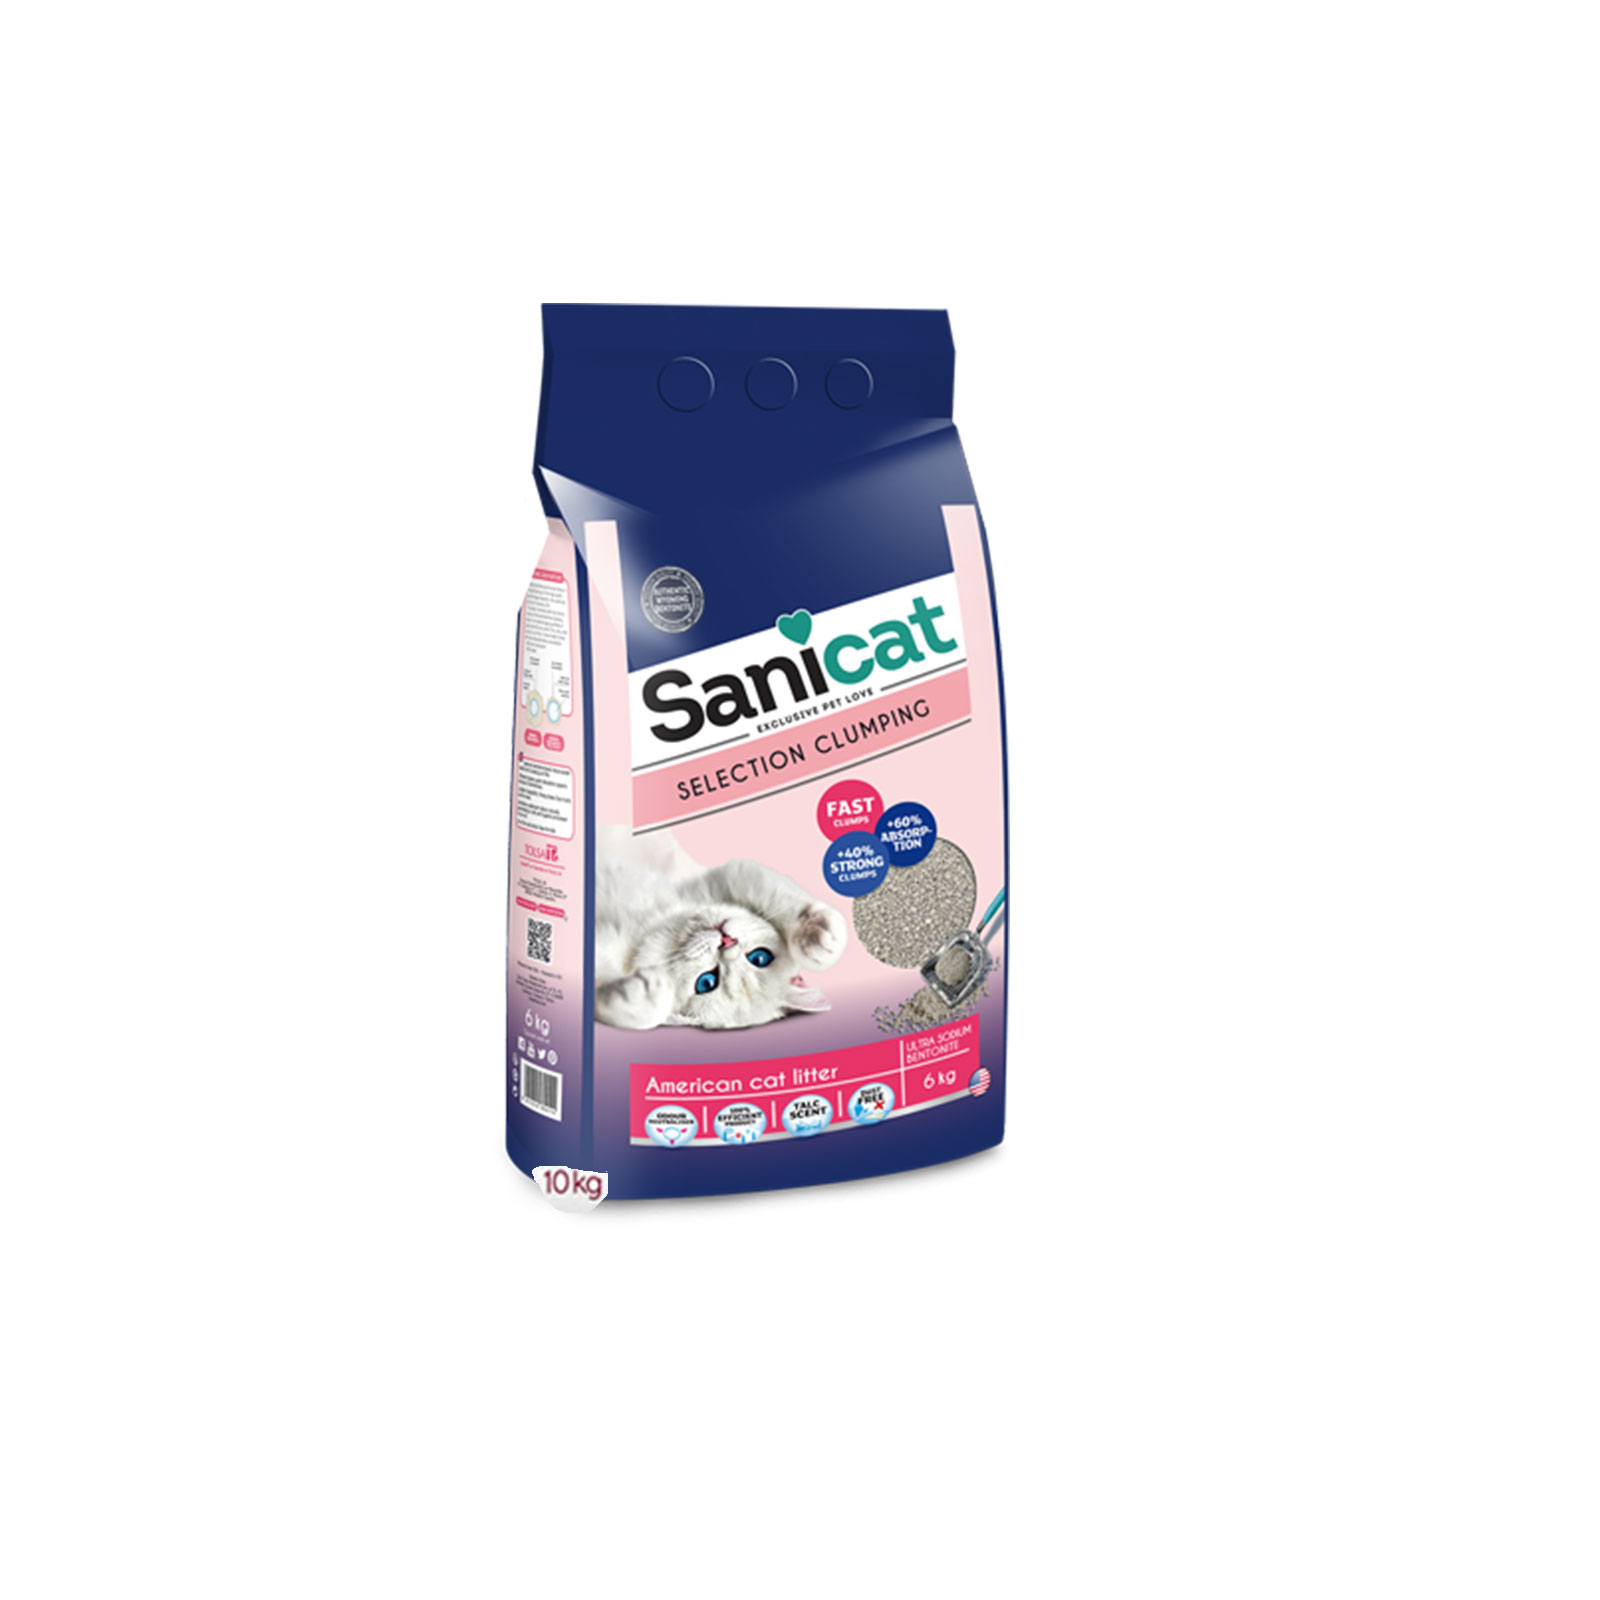 Sanicat - Selection Clumping American - Posip za mačke, najkvalitetnij američki bentonit